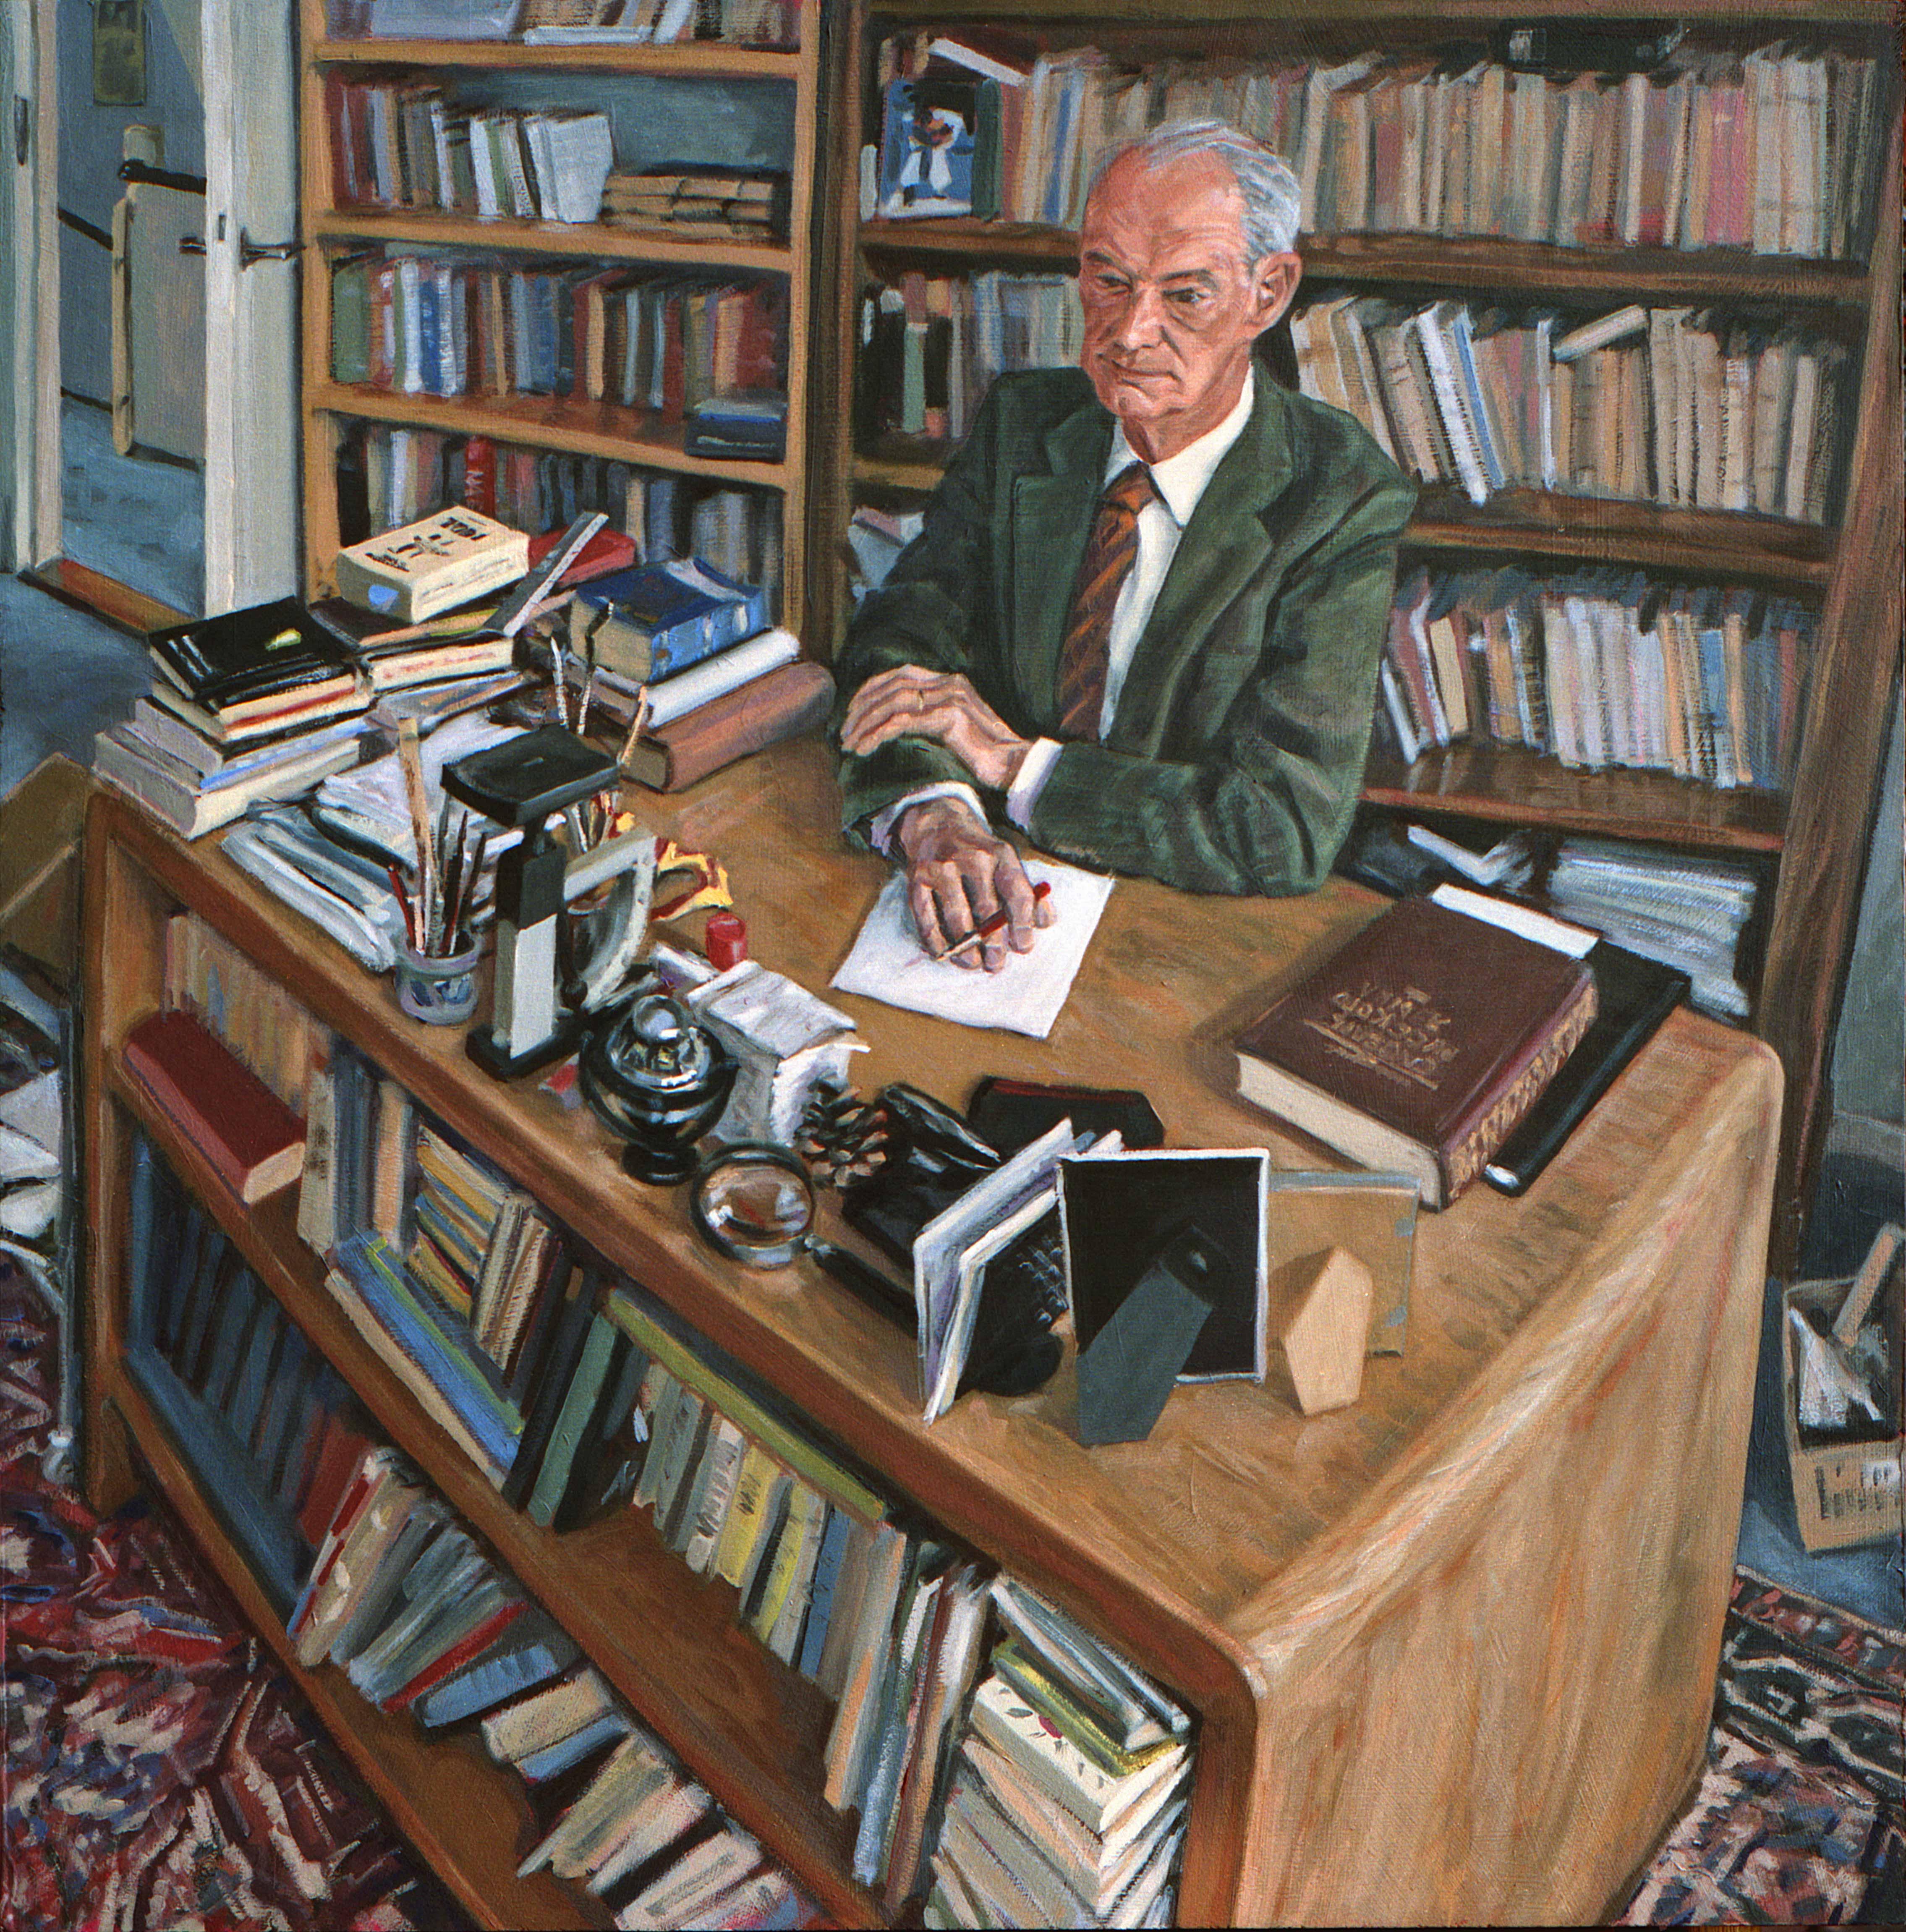 In opdracht: J. Schönfeld 1996